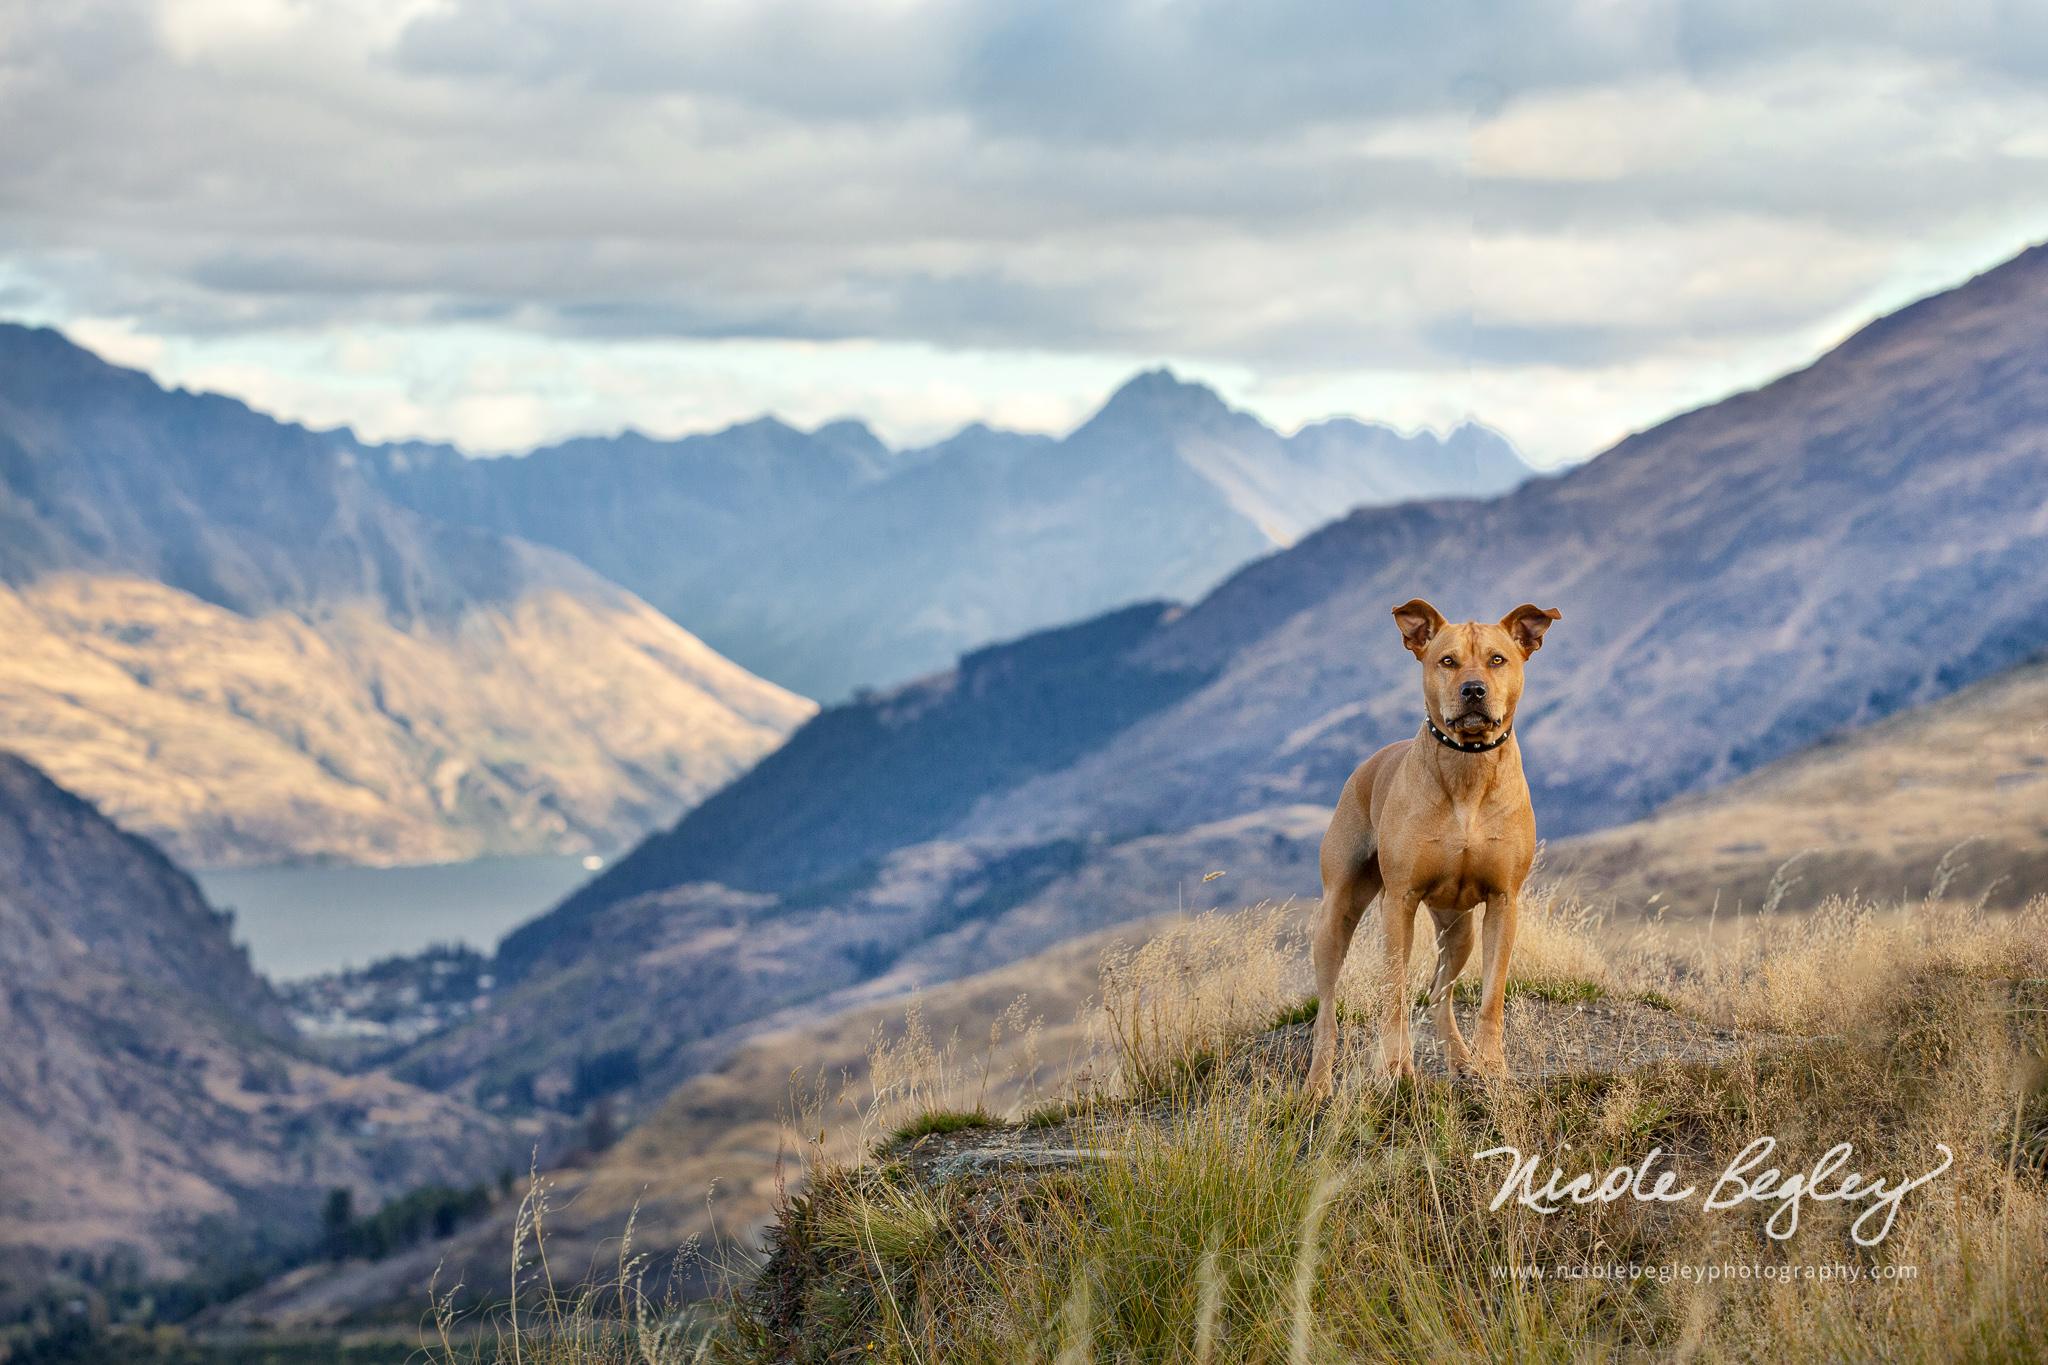 Mountaintop Nicole Begley-207